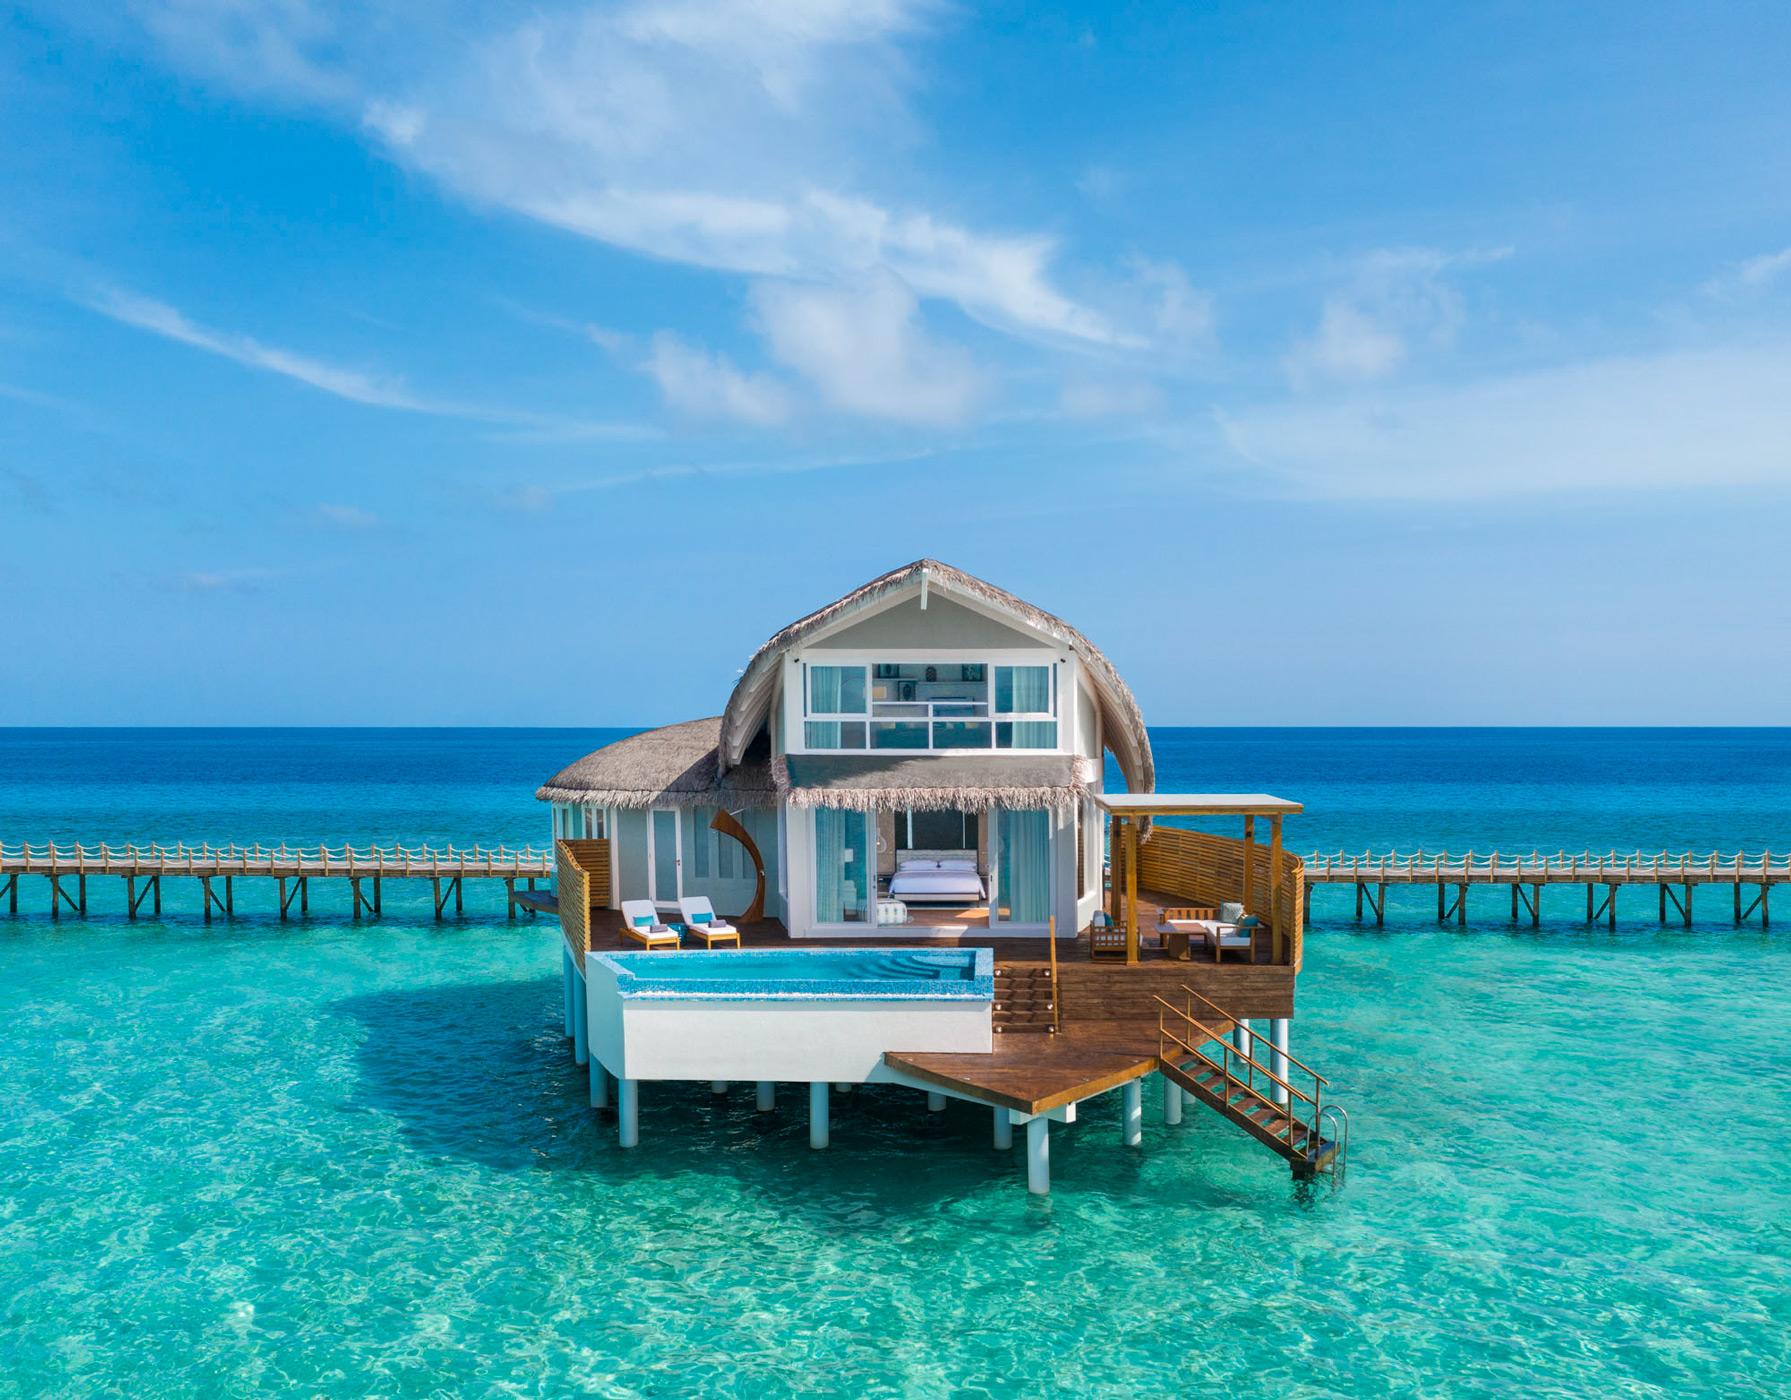 JW_MLEJS_Duplex_Overwater_Villa_Exterior